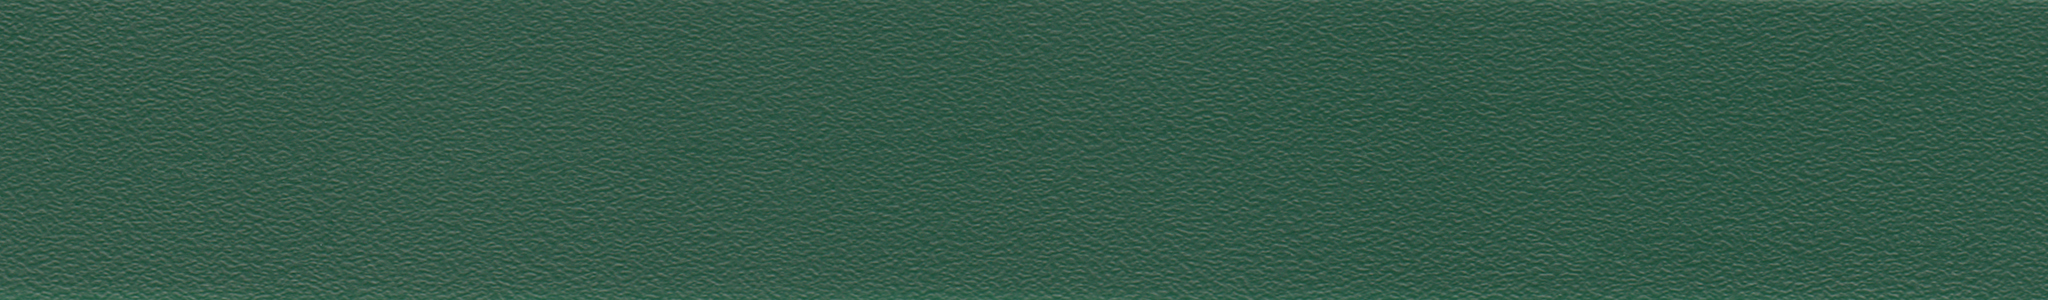 HU 16153 ABS hrana zelená perla XG